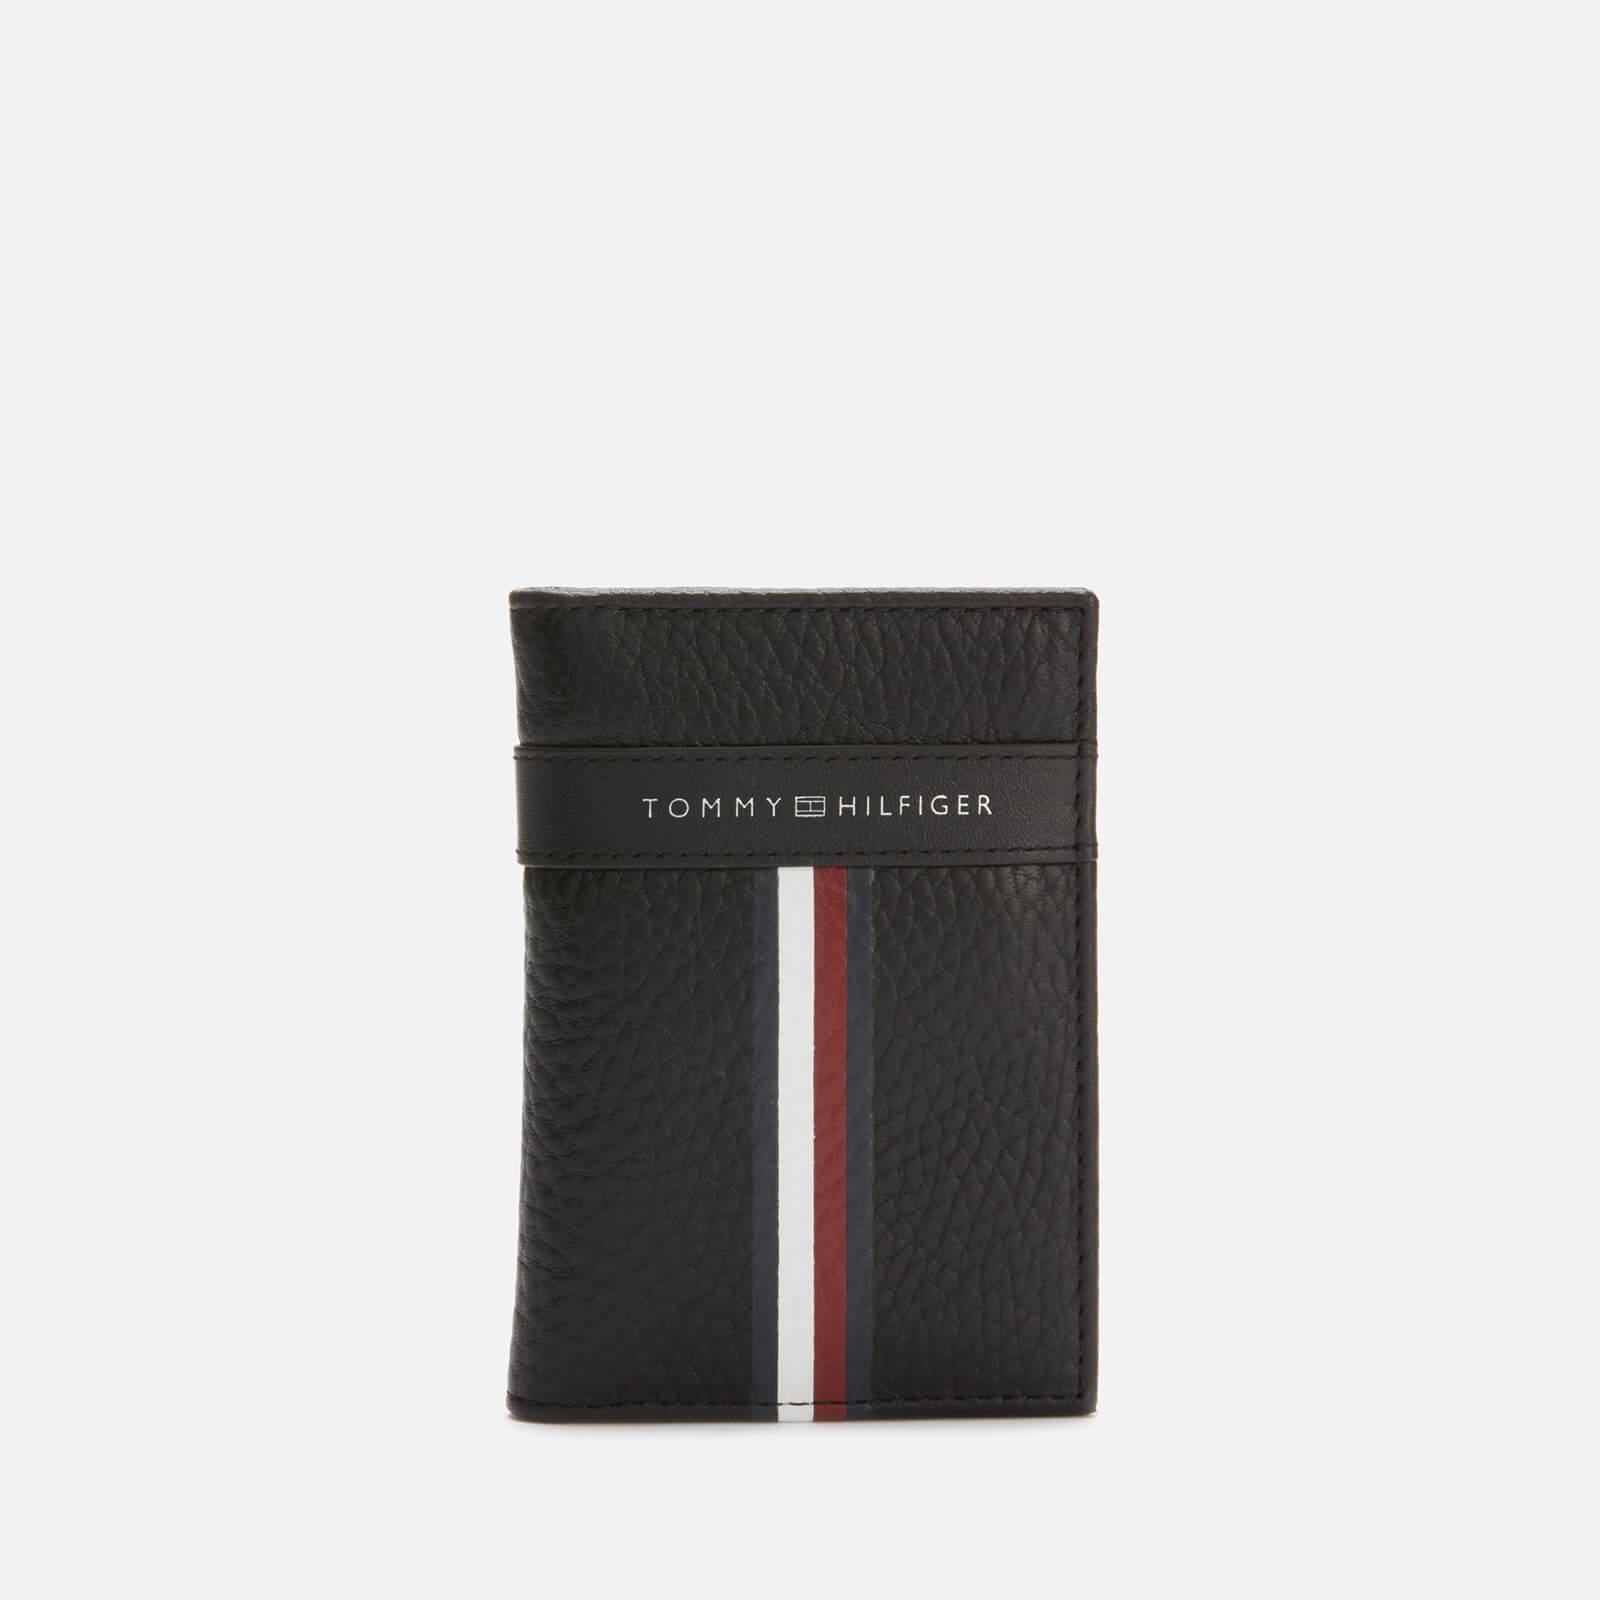 Tommy Hilfiger Men's Corporate Leather Mini Credit Card Bifold - Black